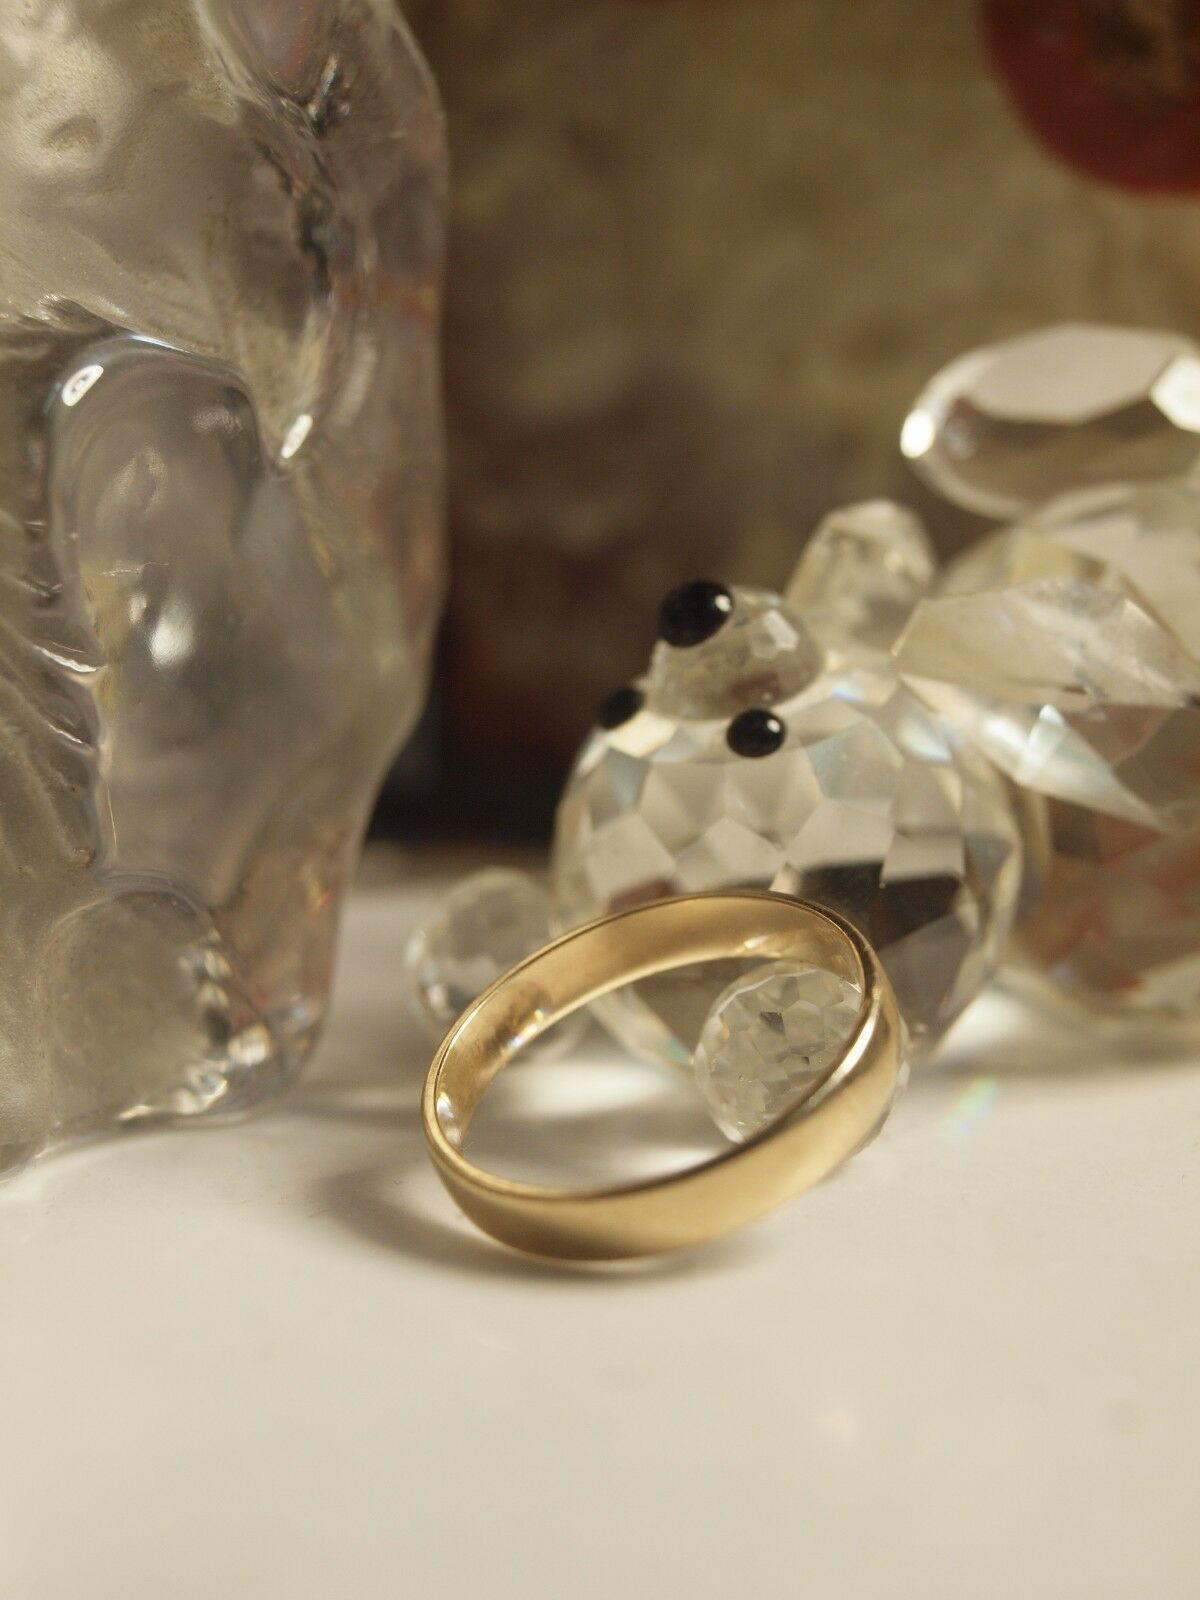 GENUINE   SOLID 375 YELLOW gold UNISEX WEDDER RING